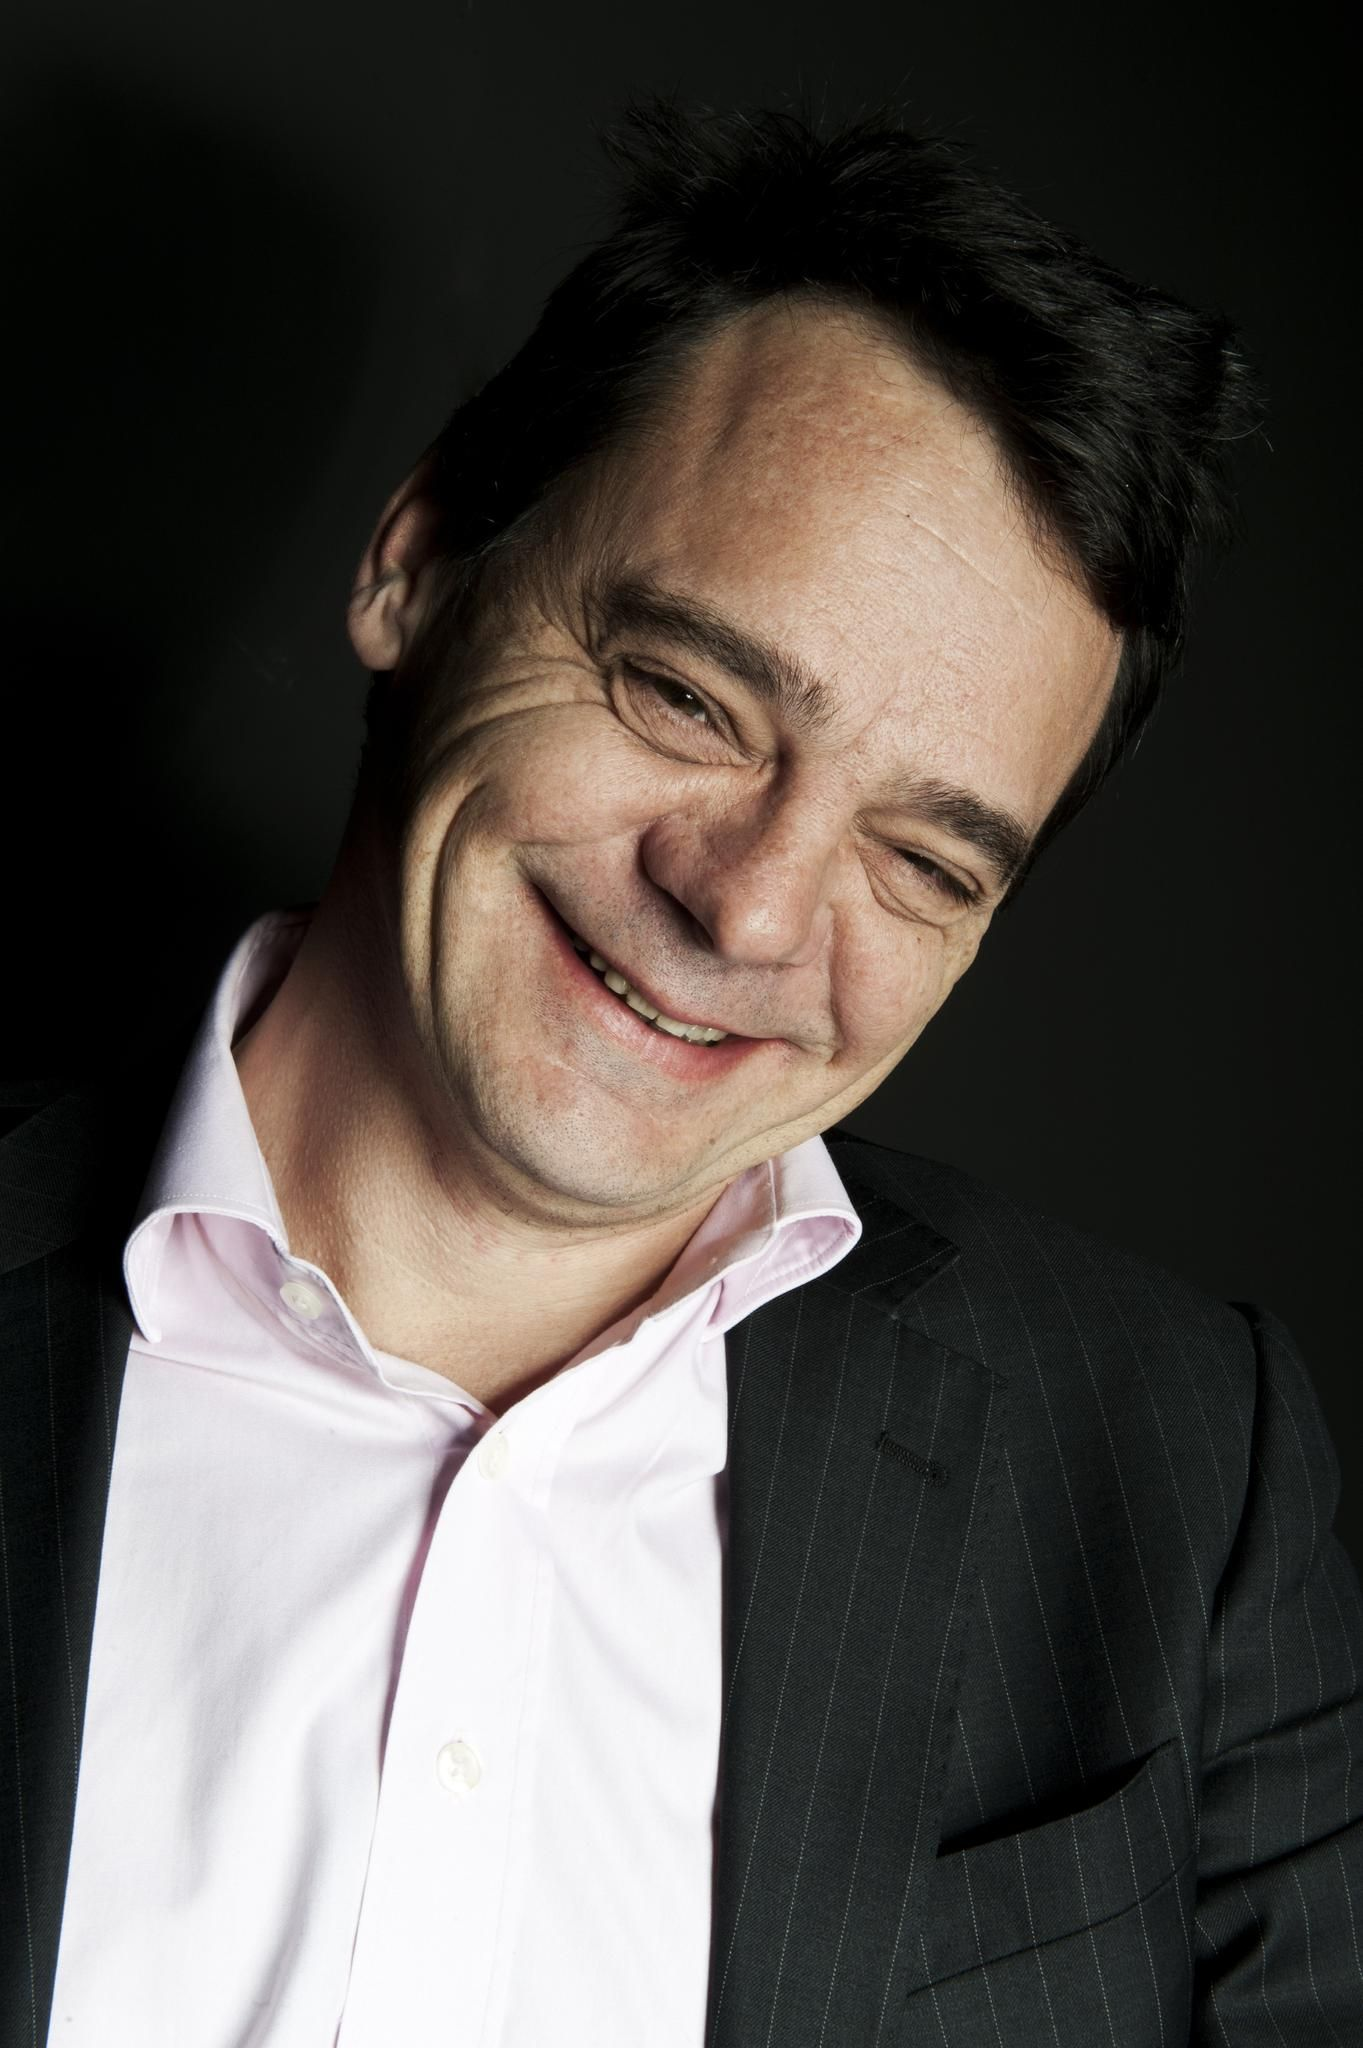 Jean-Francois Dargein